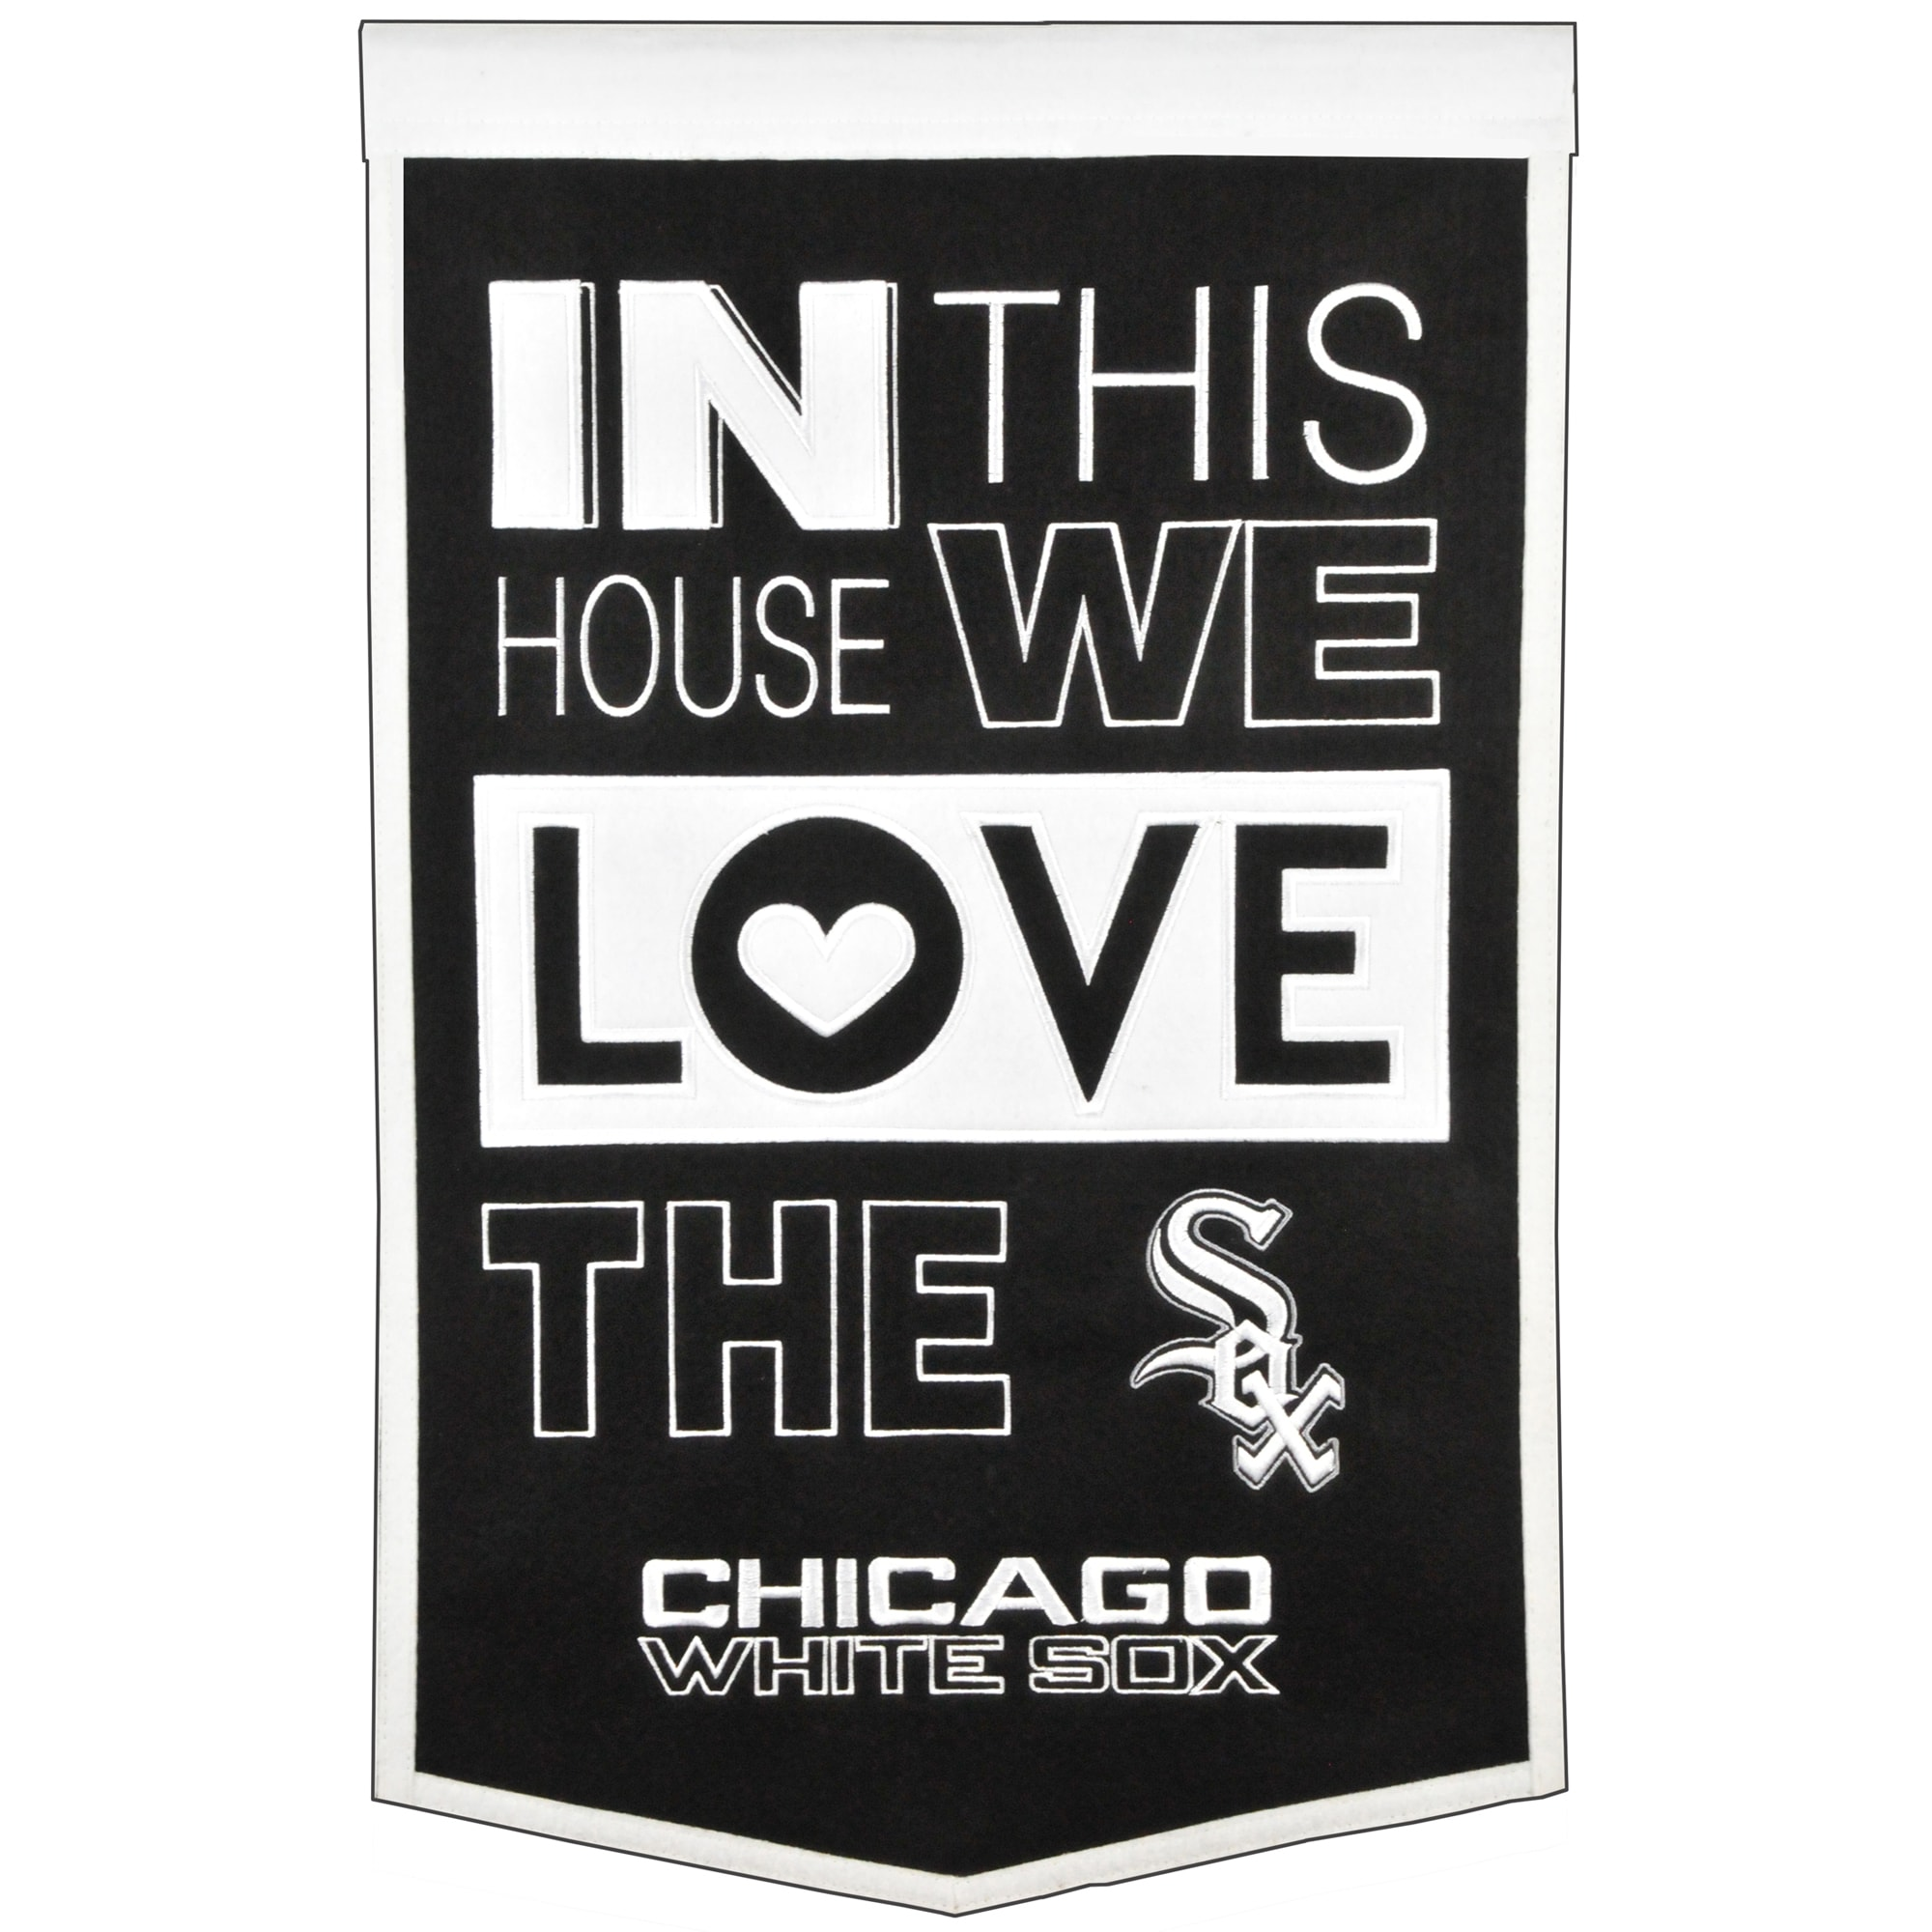 Chicago White Sox 15'' x 24'' Home Banner - Black/White